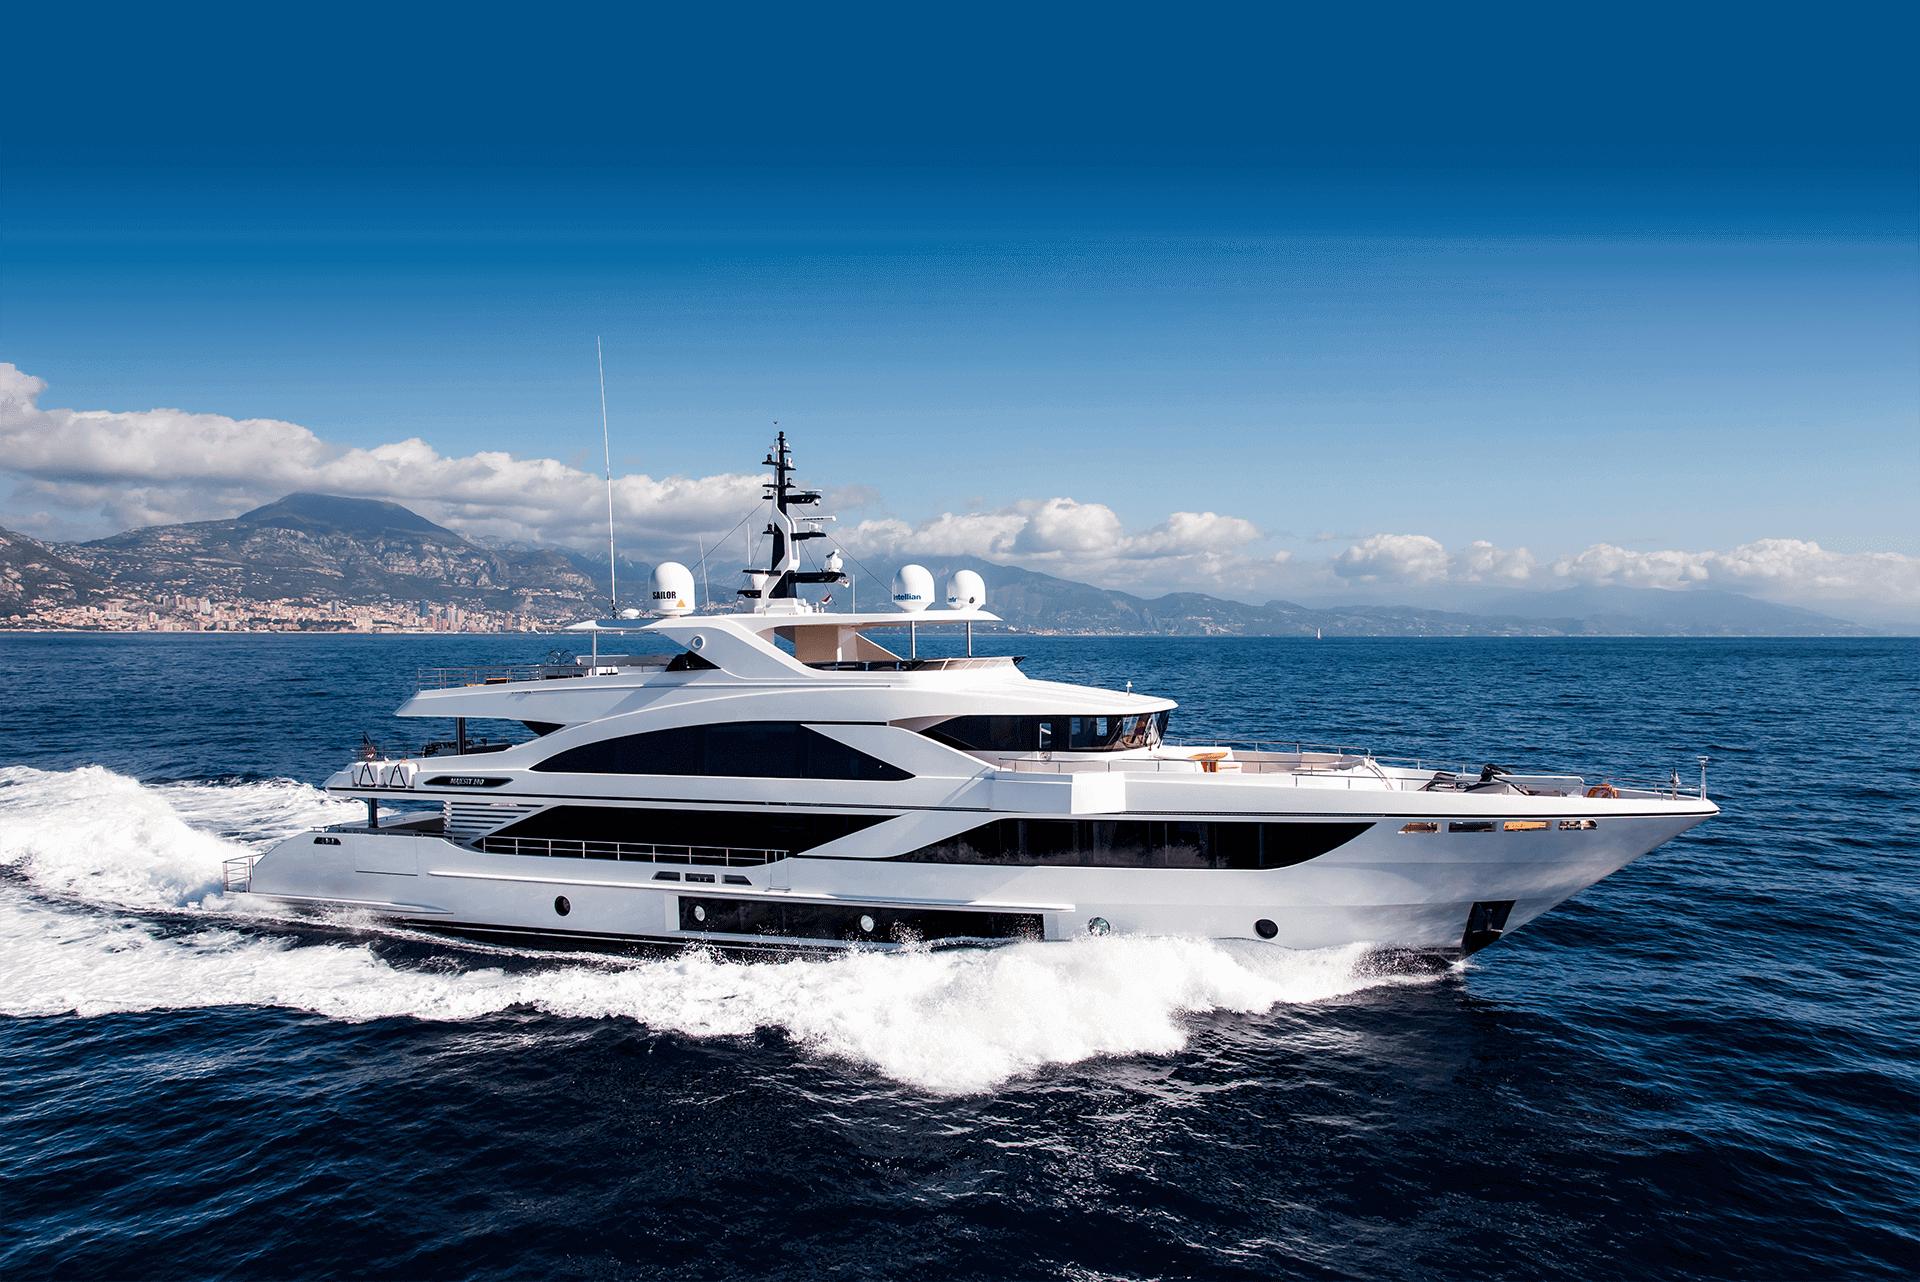 gulf craft majesty 140 price yacht for sale exterior cruising